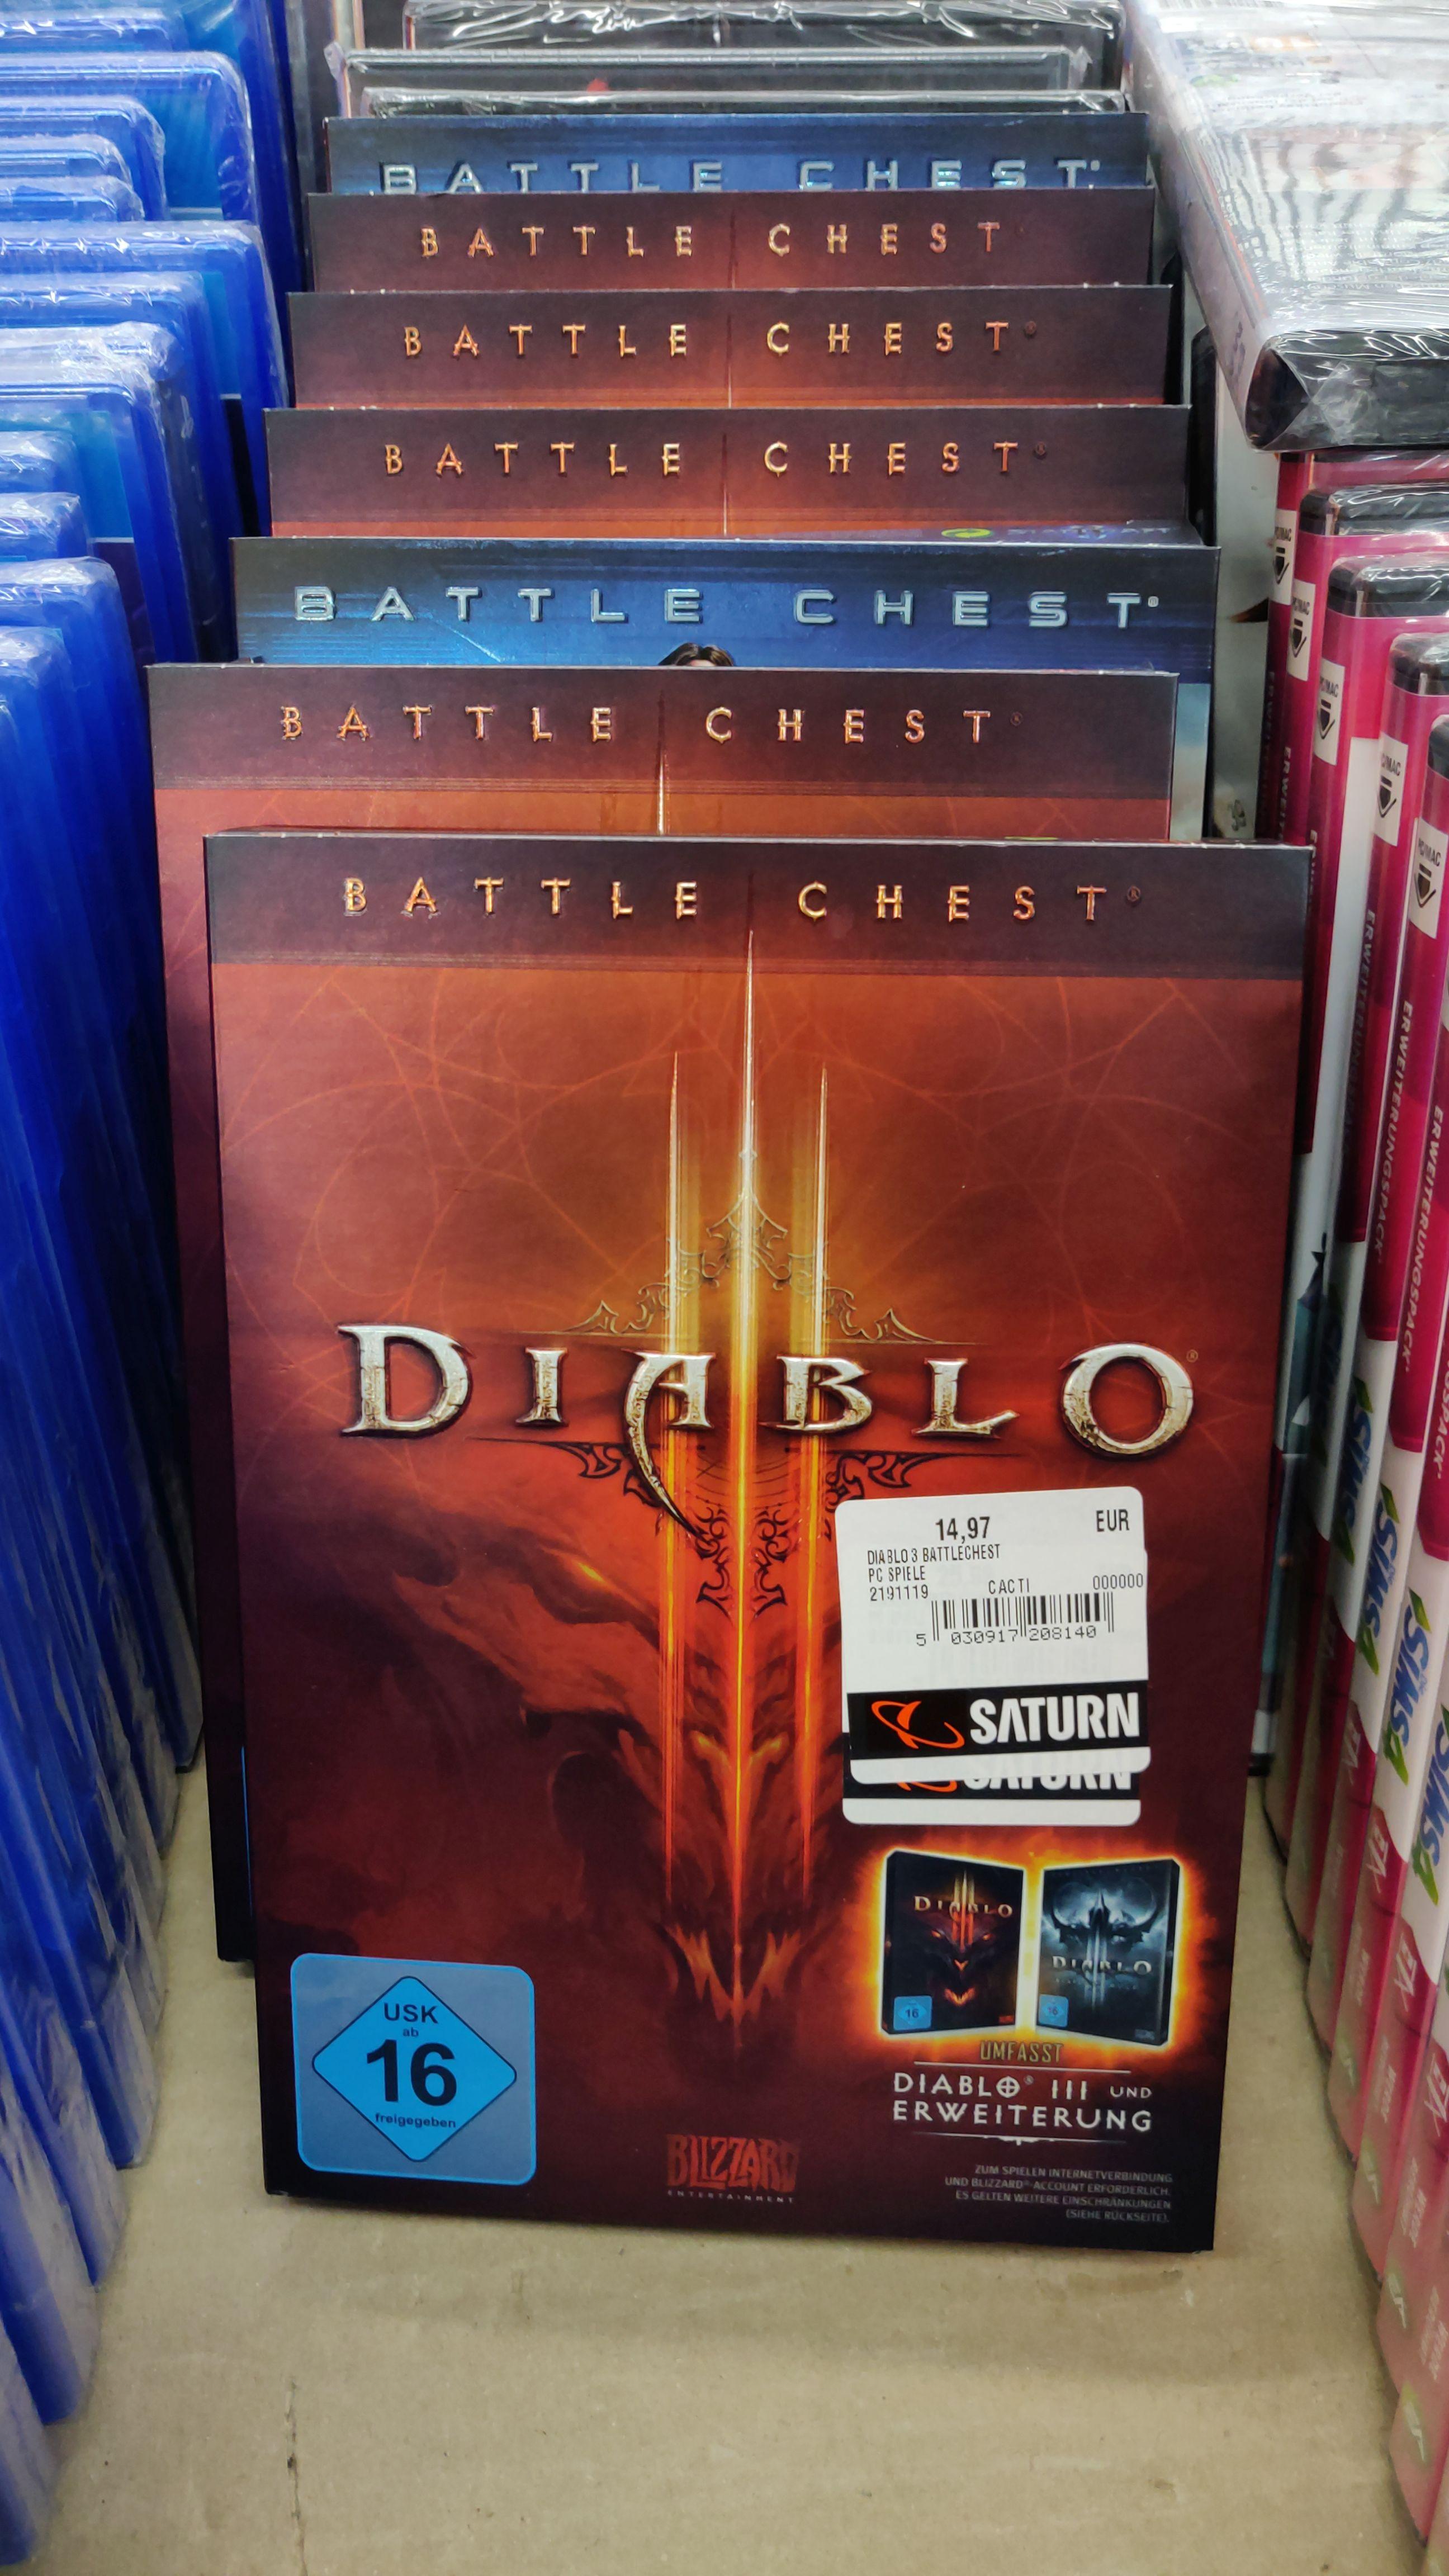 [Saturn Kaiserslautern] Diablo 3 Battlechest (PC) - Starcraft 2 Battlechest (PC) - Resident Evil 2 (PS4) - COD Black Ops 4 (Xbox One)